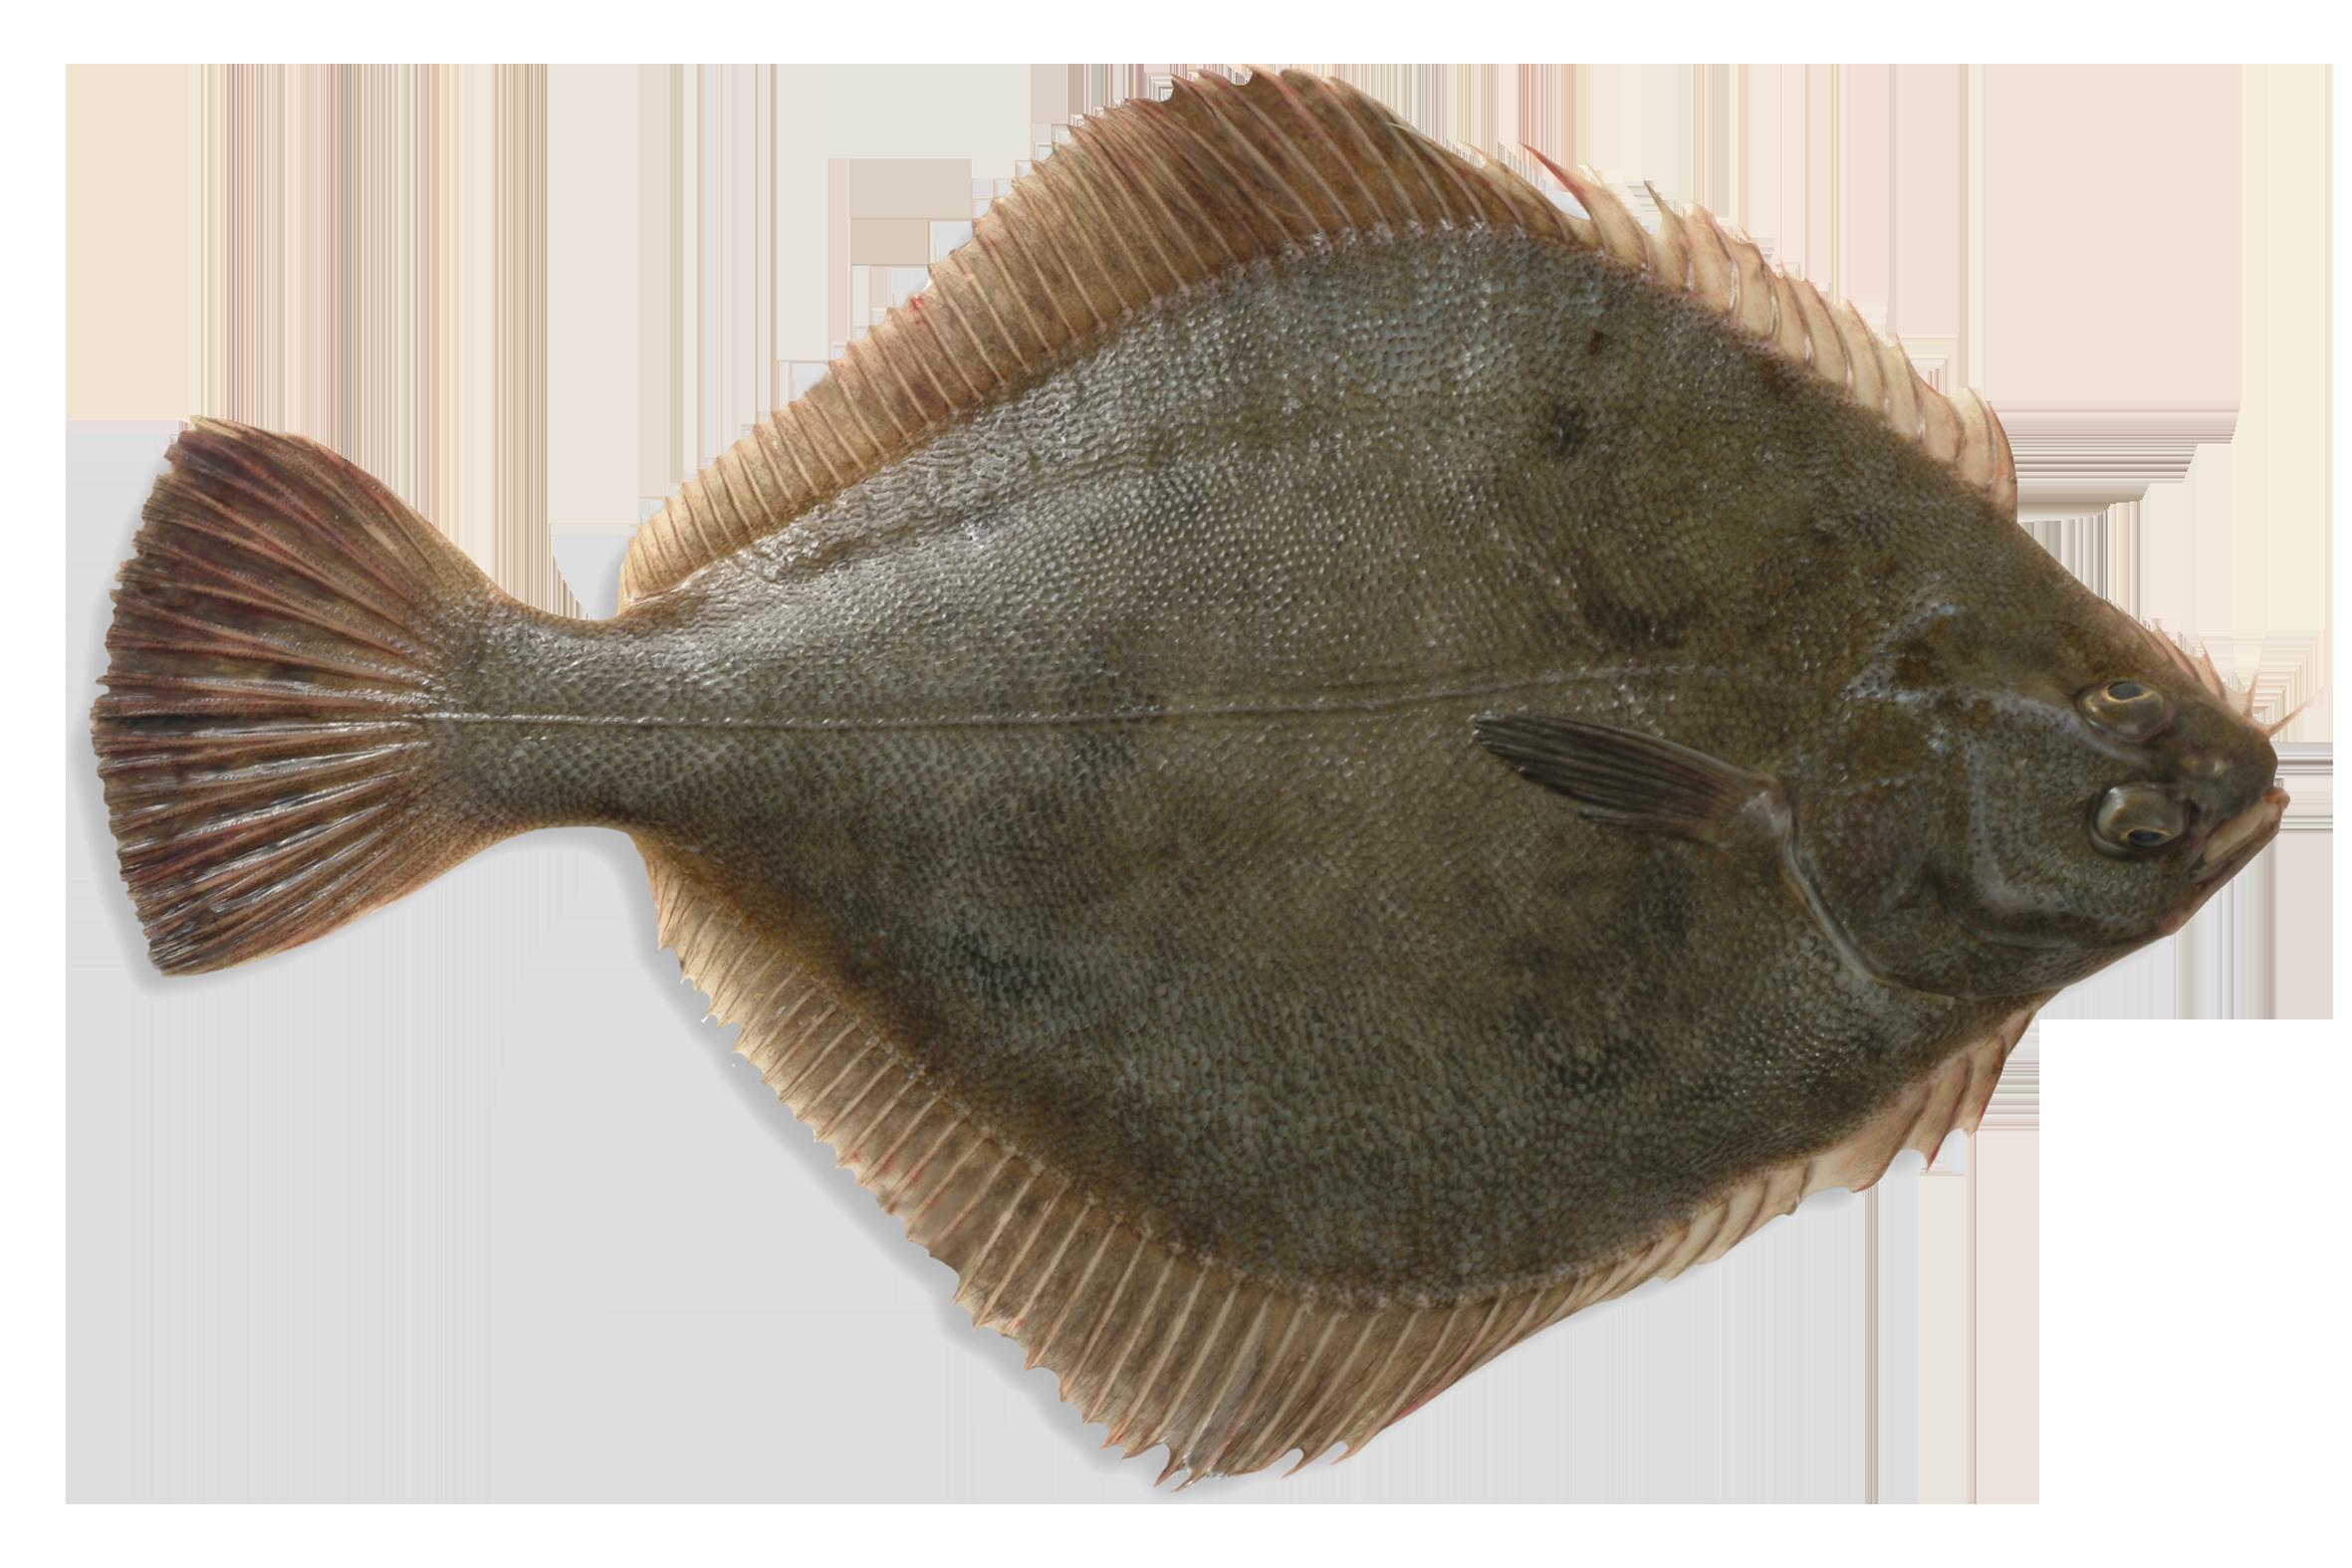 Sand flounder